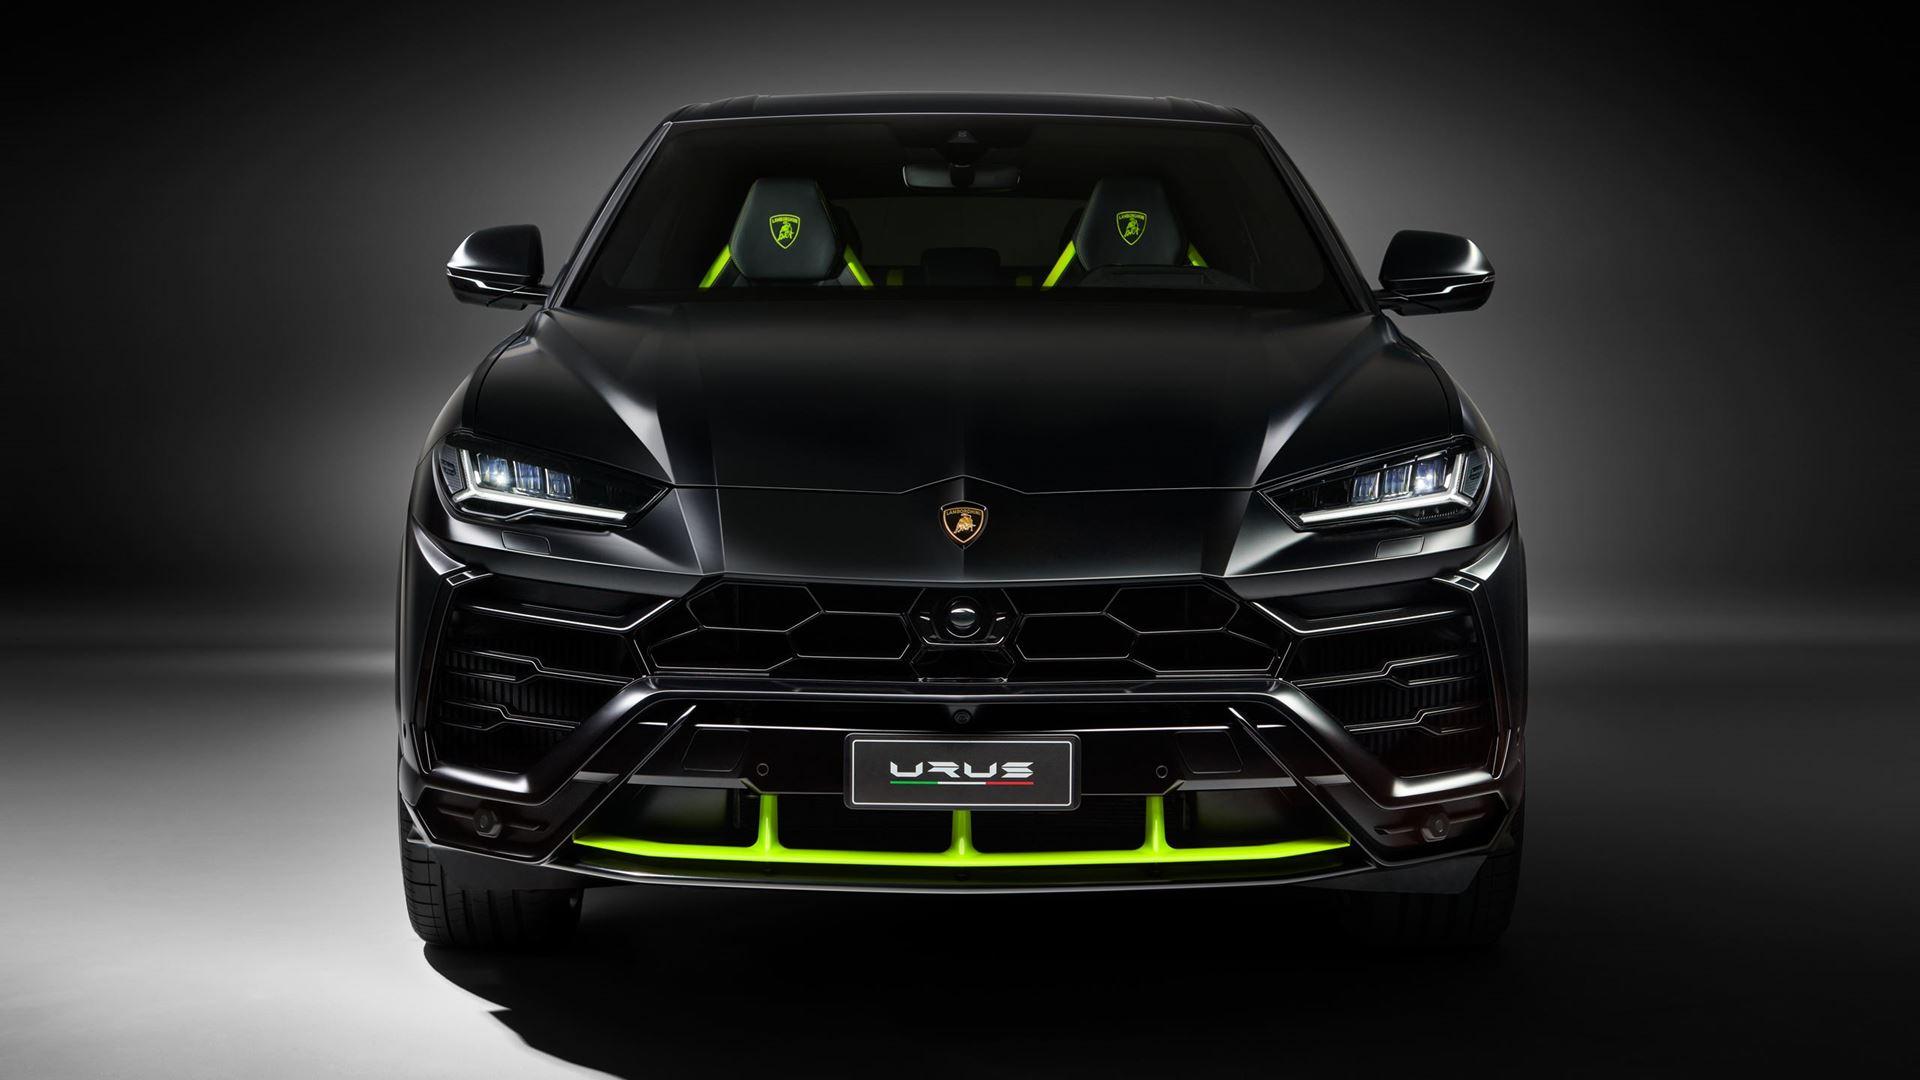 A record September for Automobili Lamborghini - Image 4